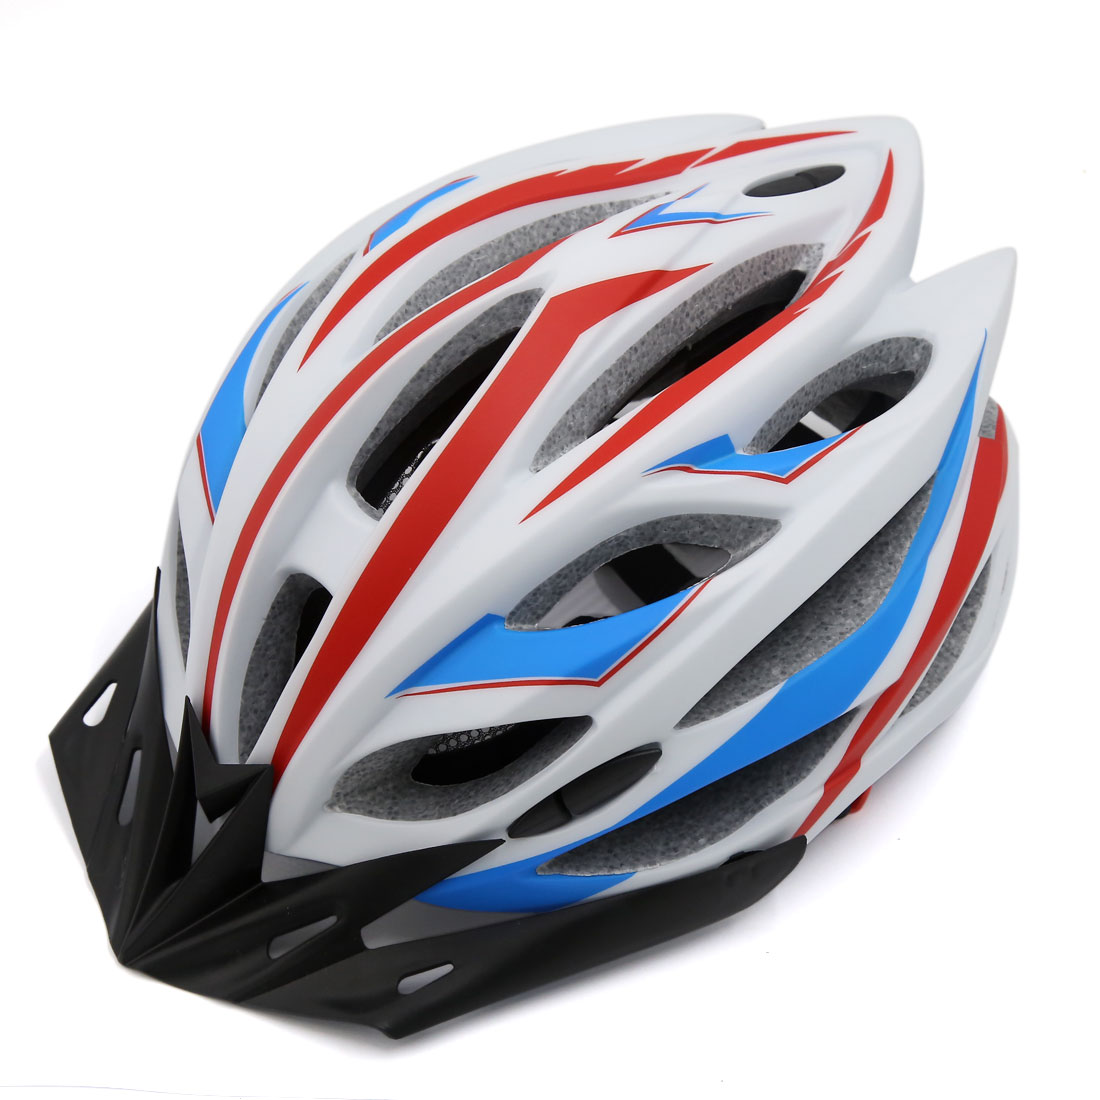 Fit 54-60cm Head Girth 22 Vents Road Mountain MTB Bike Helmet White Red Blue